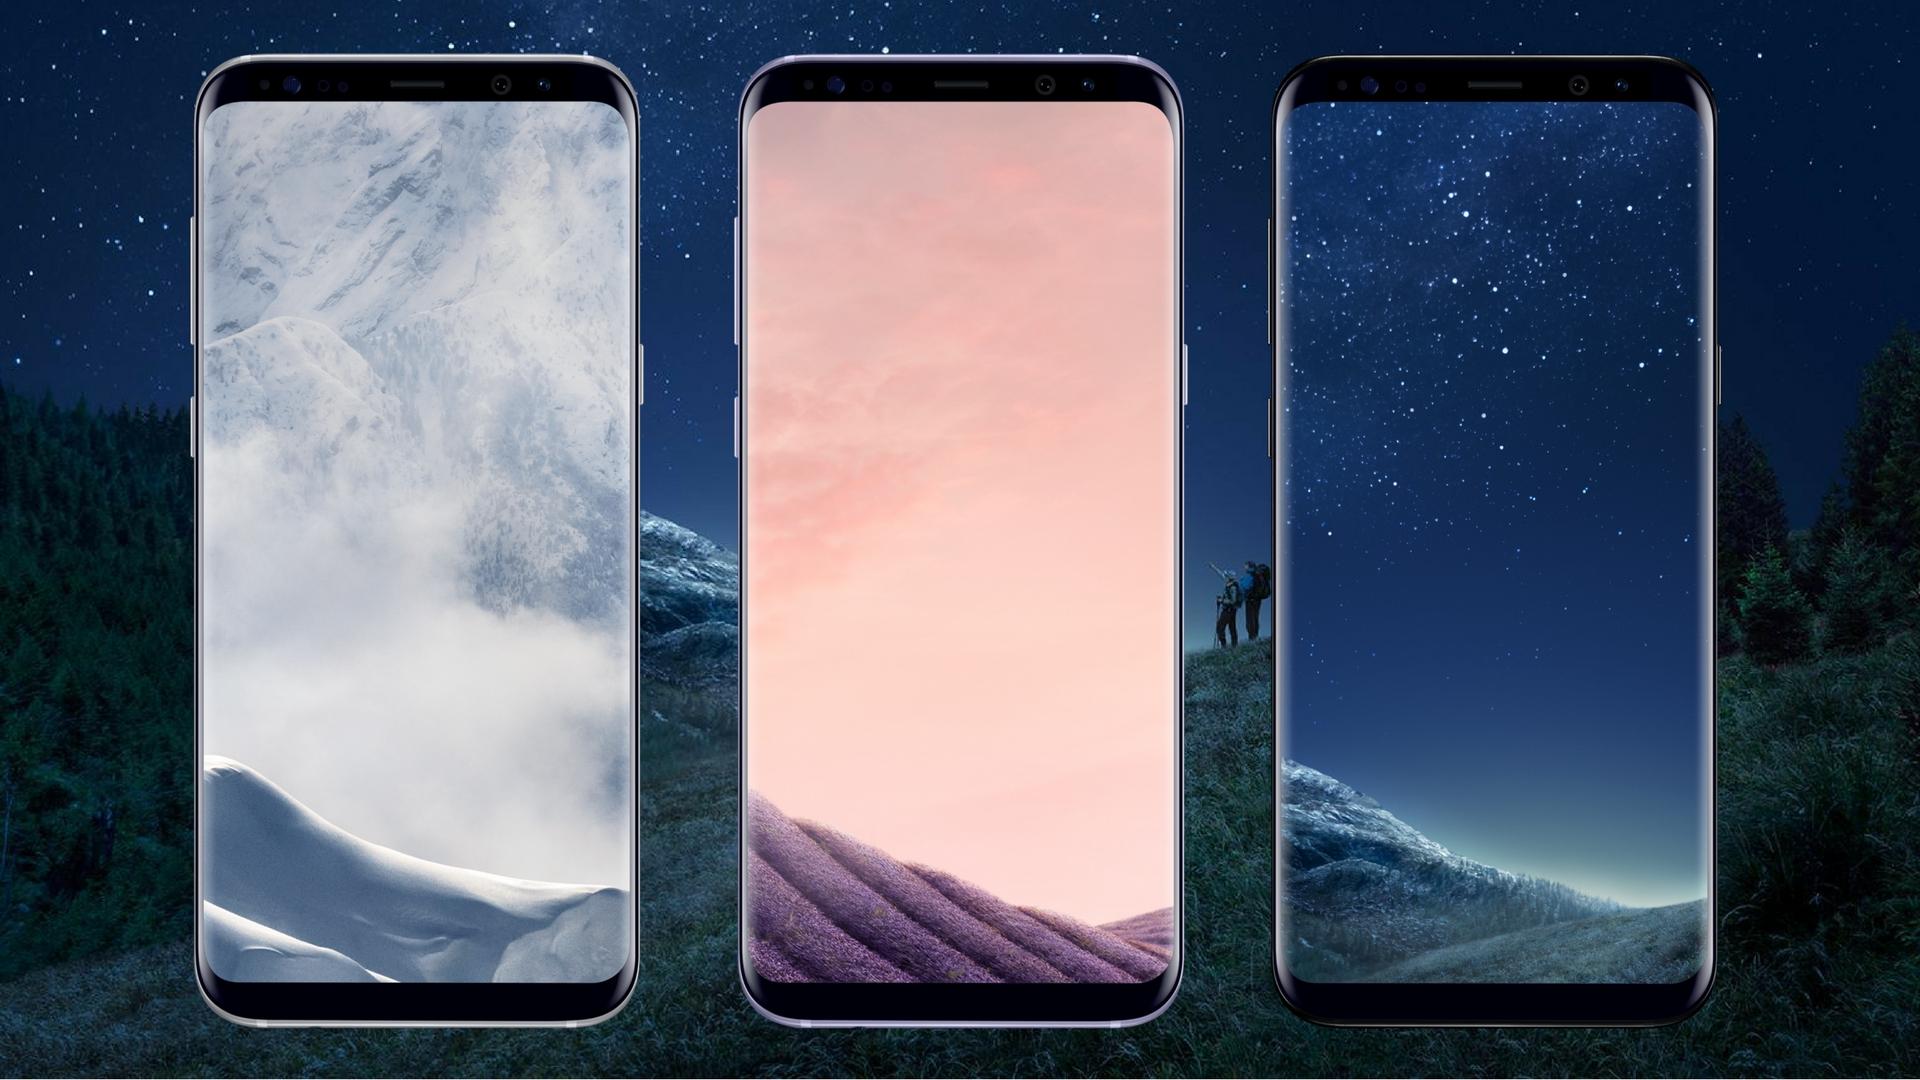 samsung-galaxy-s8-s8-plus-smartphone